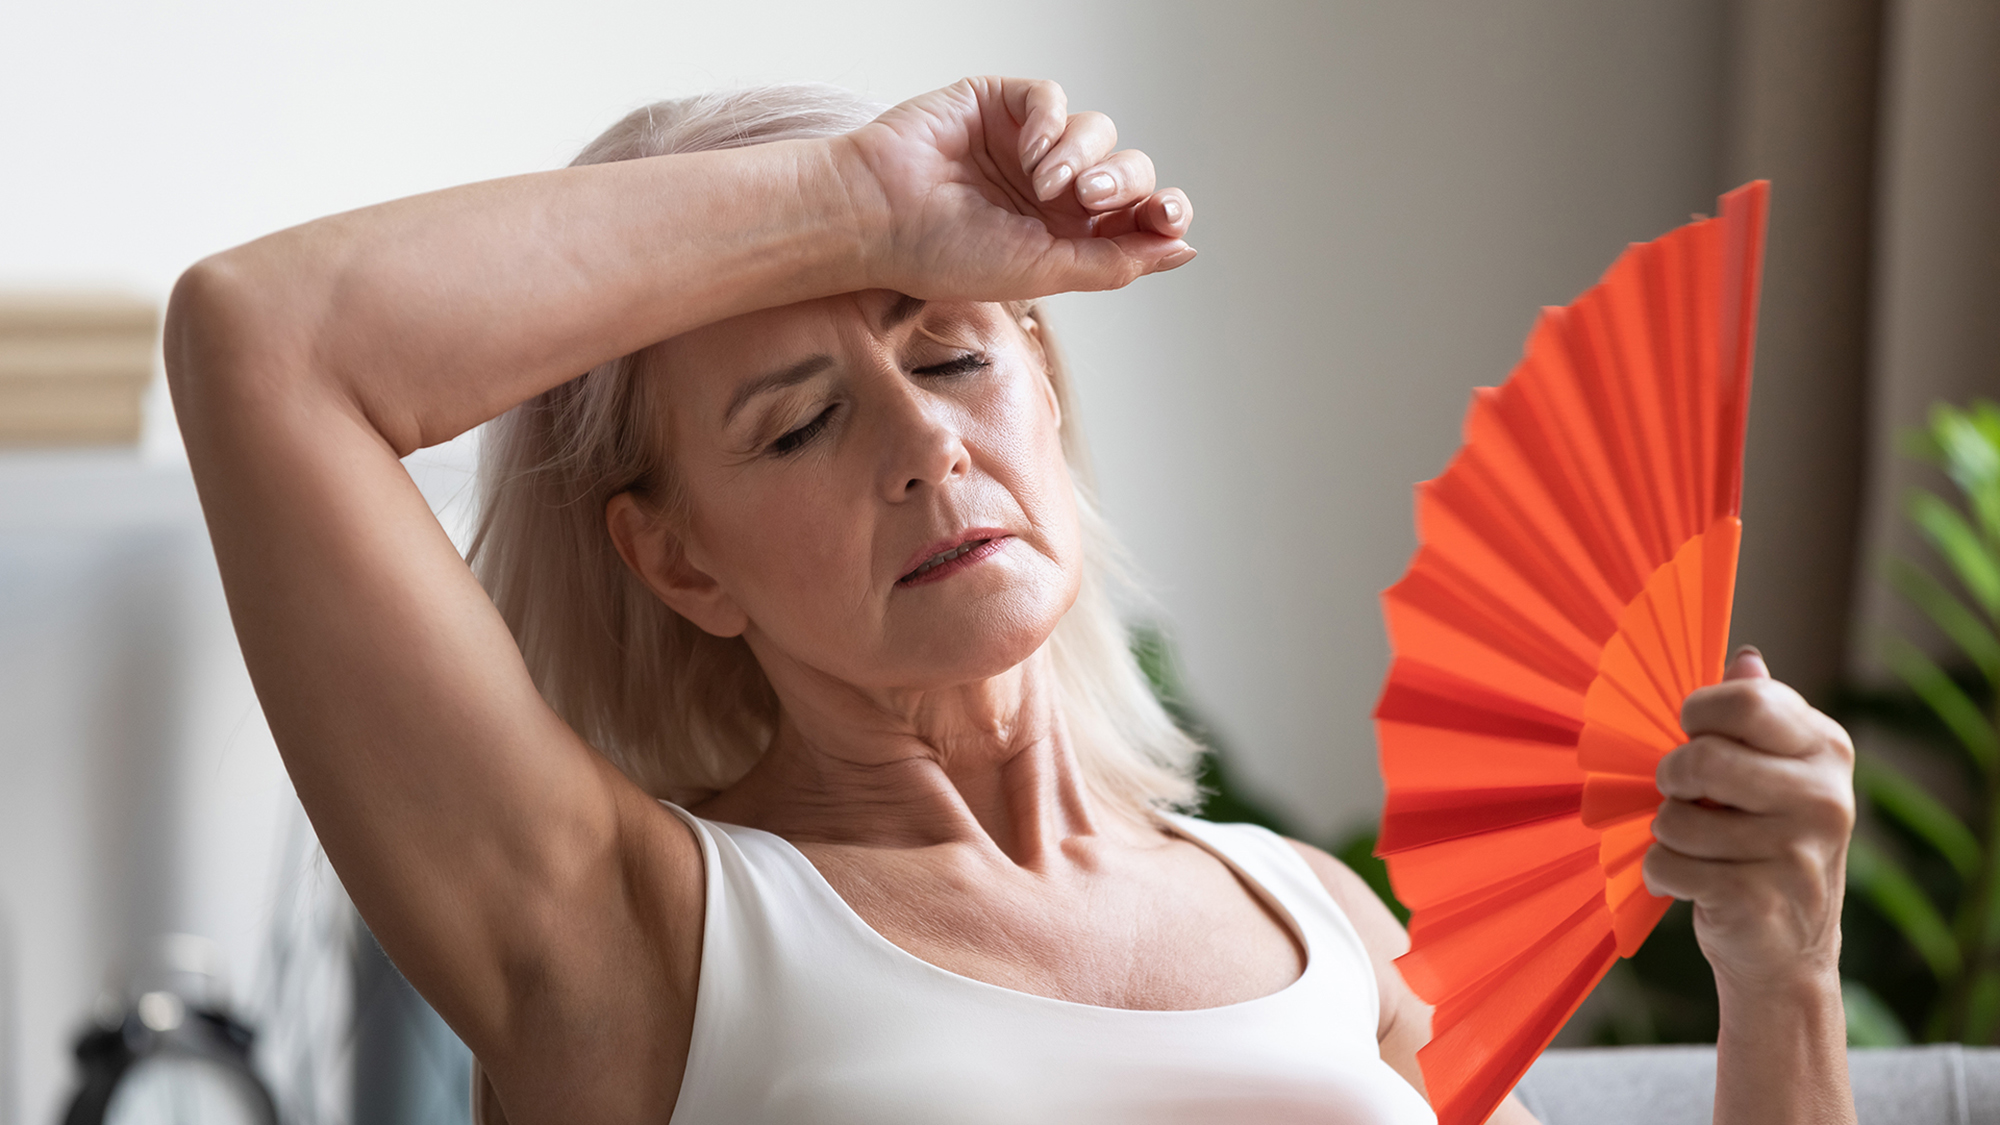 5 natural ways to alleviate menopause symptoms